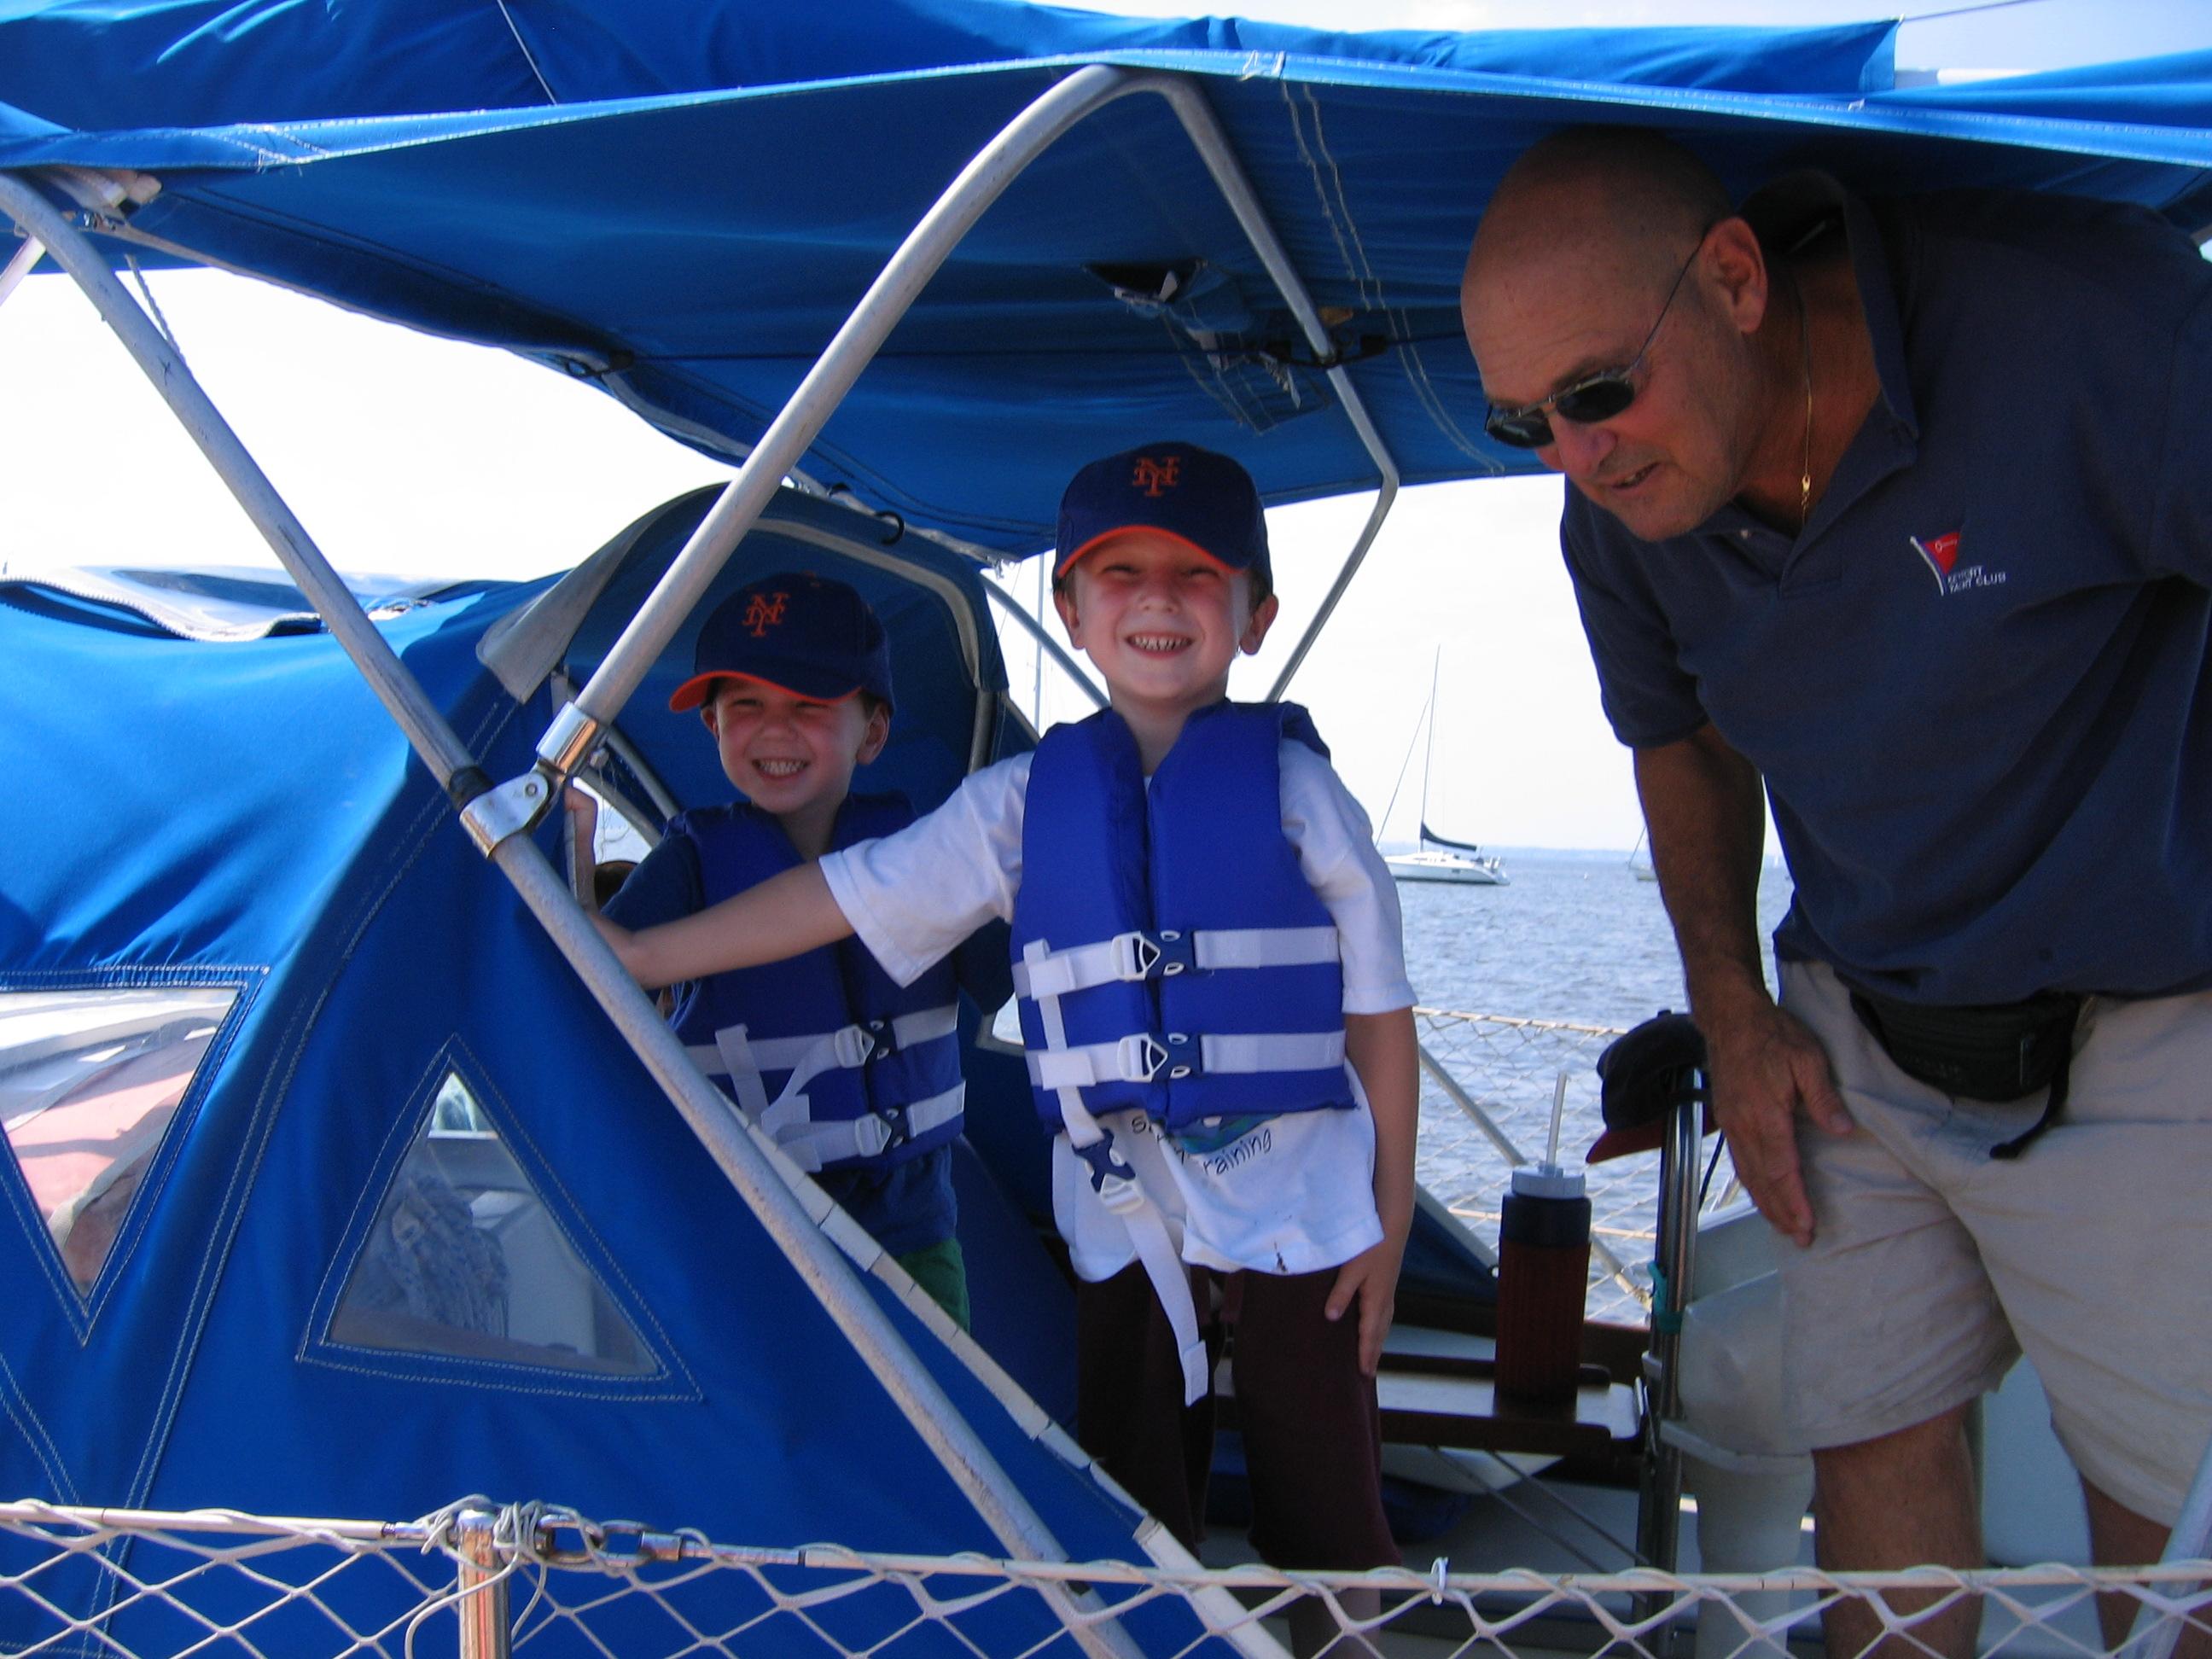 Charlie Ezra and Zeke on Windbairn